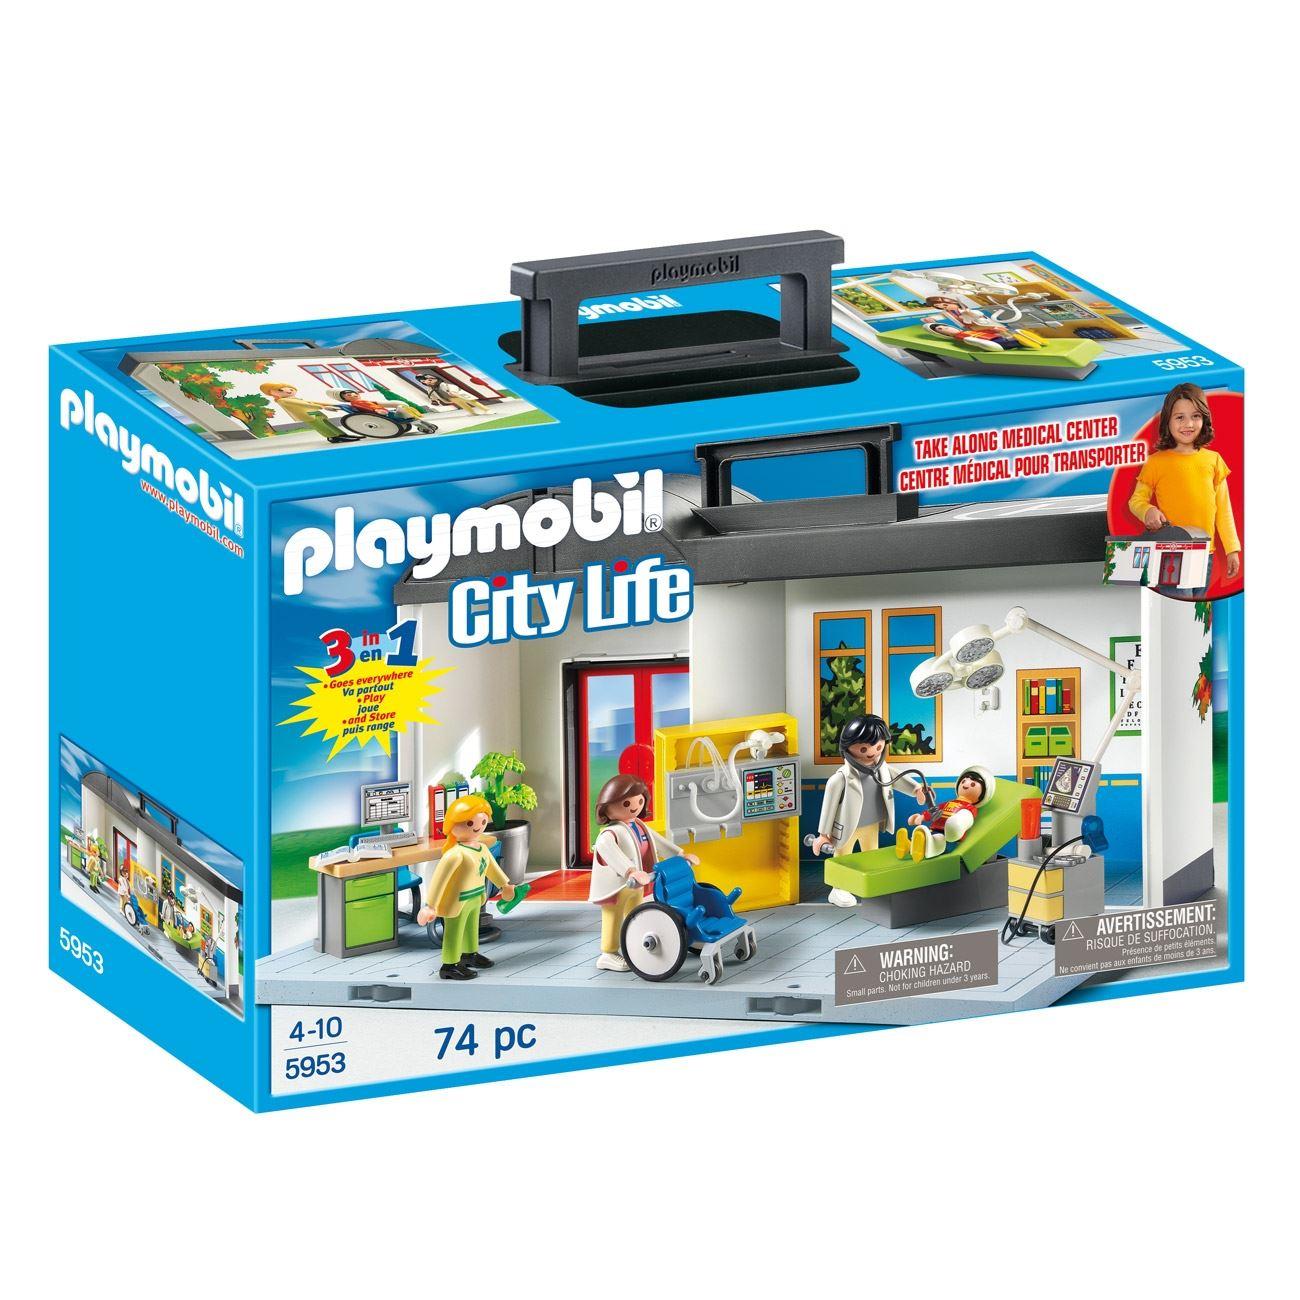 0a8f33d6a0 PLAYMOBIL Βαλιτσάκι Νοσοκομείο   Playmobil Παιδικός Σταθμός